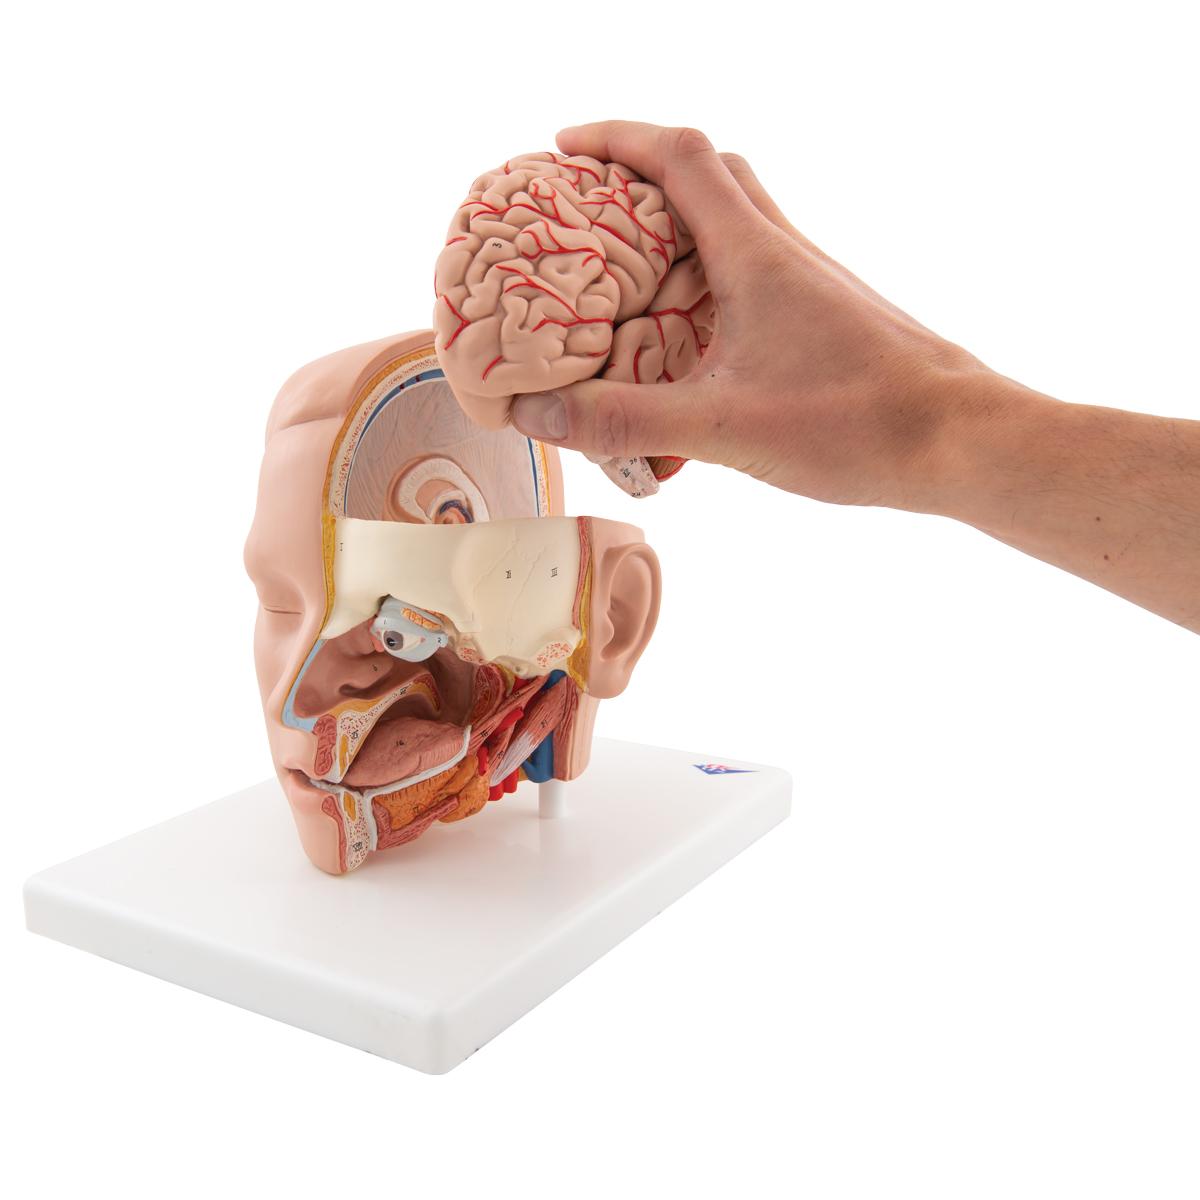 Anatomical Teaching Models Plastic Anatomy Models Head Model